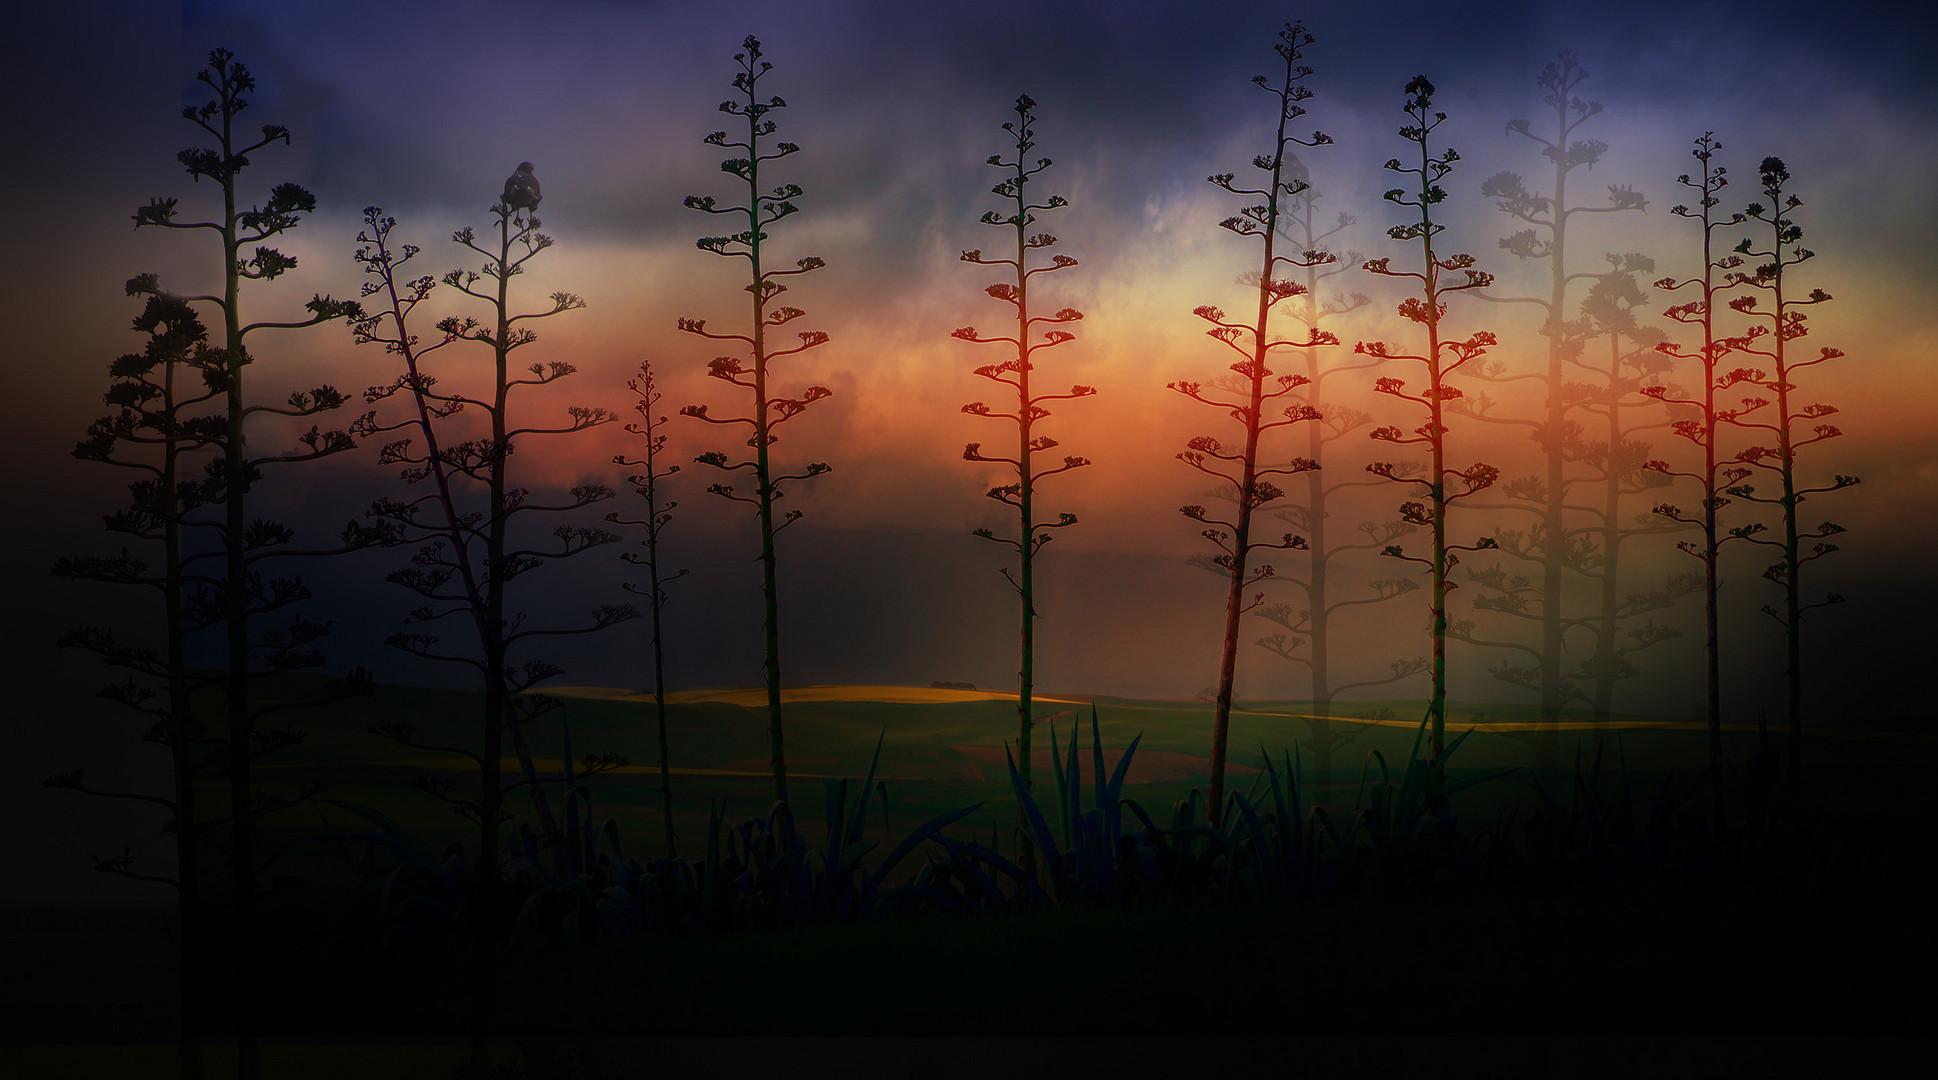 sisal bl ten foto bild sunset world natur bilder auf fotocommunity. Black Bedroom Furniture Sets. Home Design Ideas